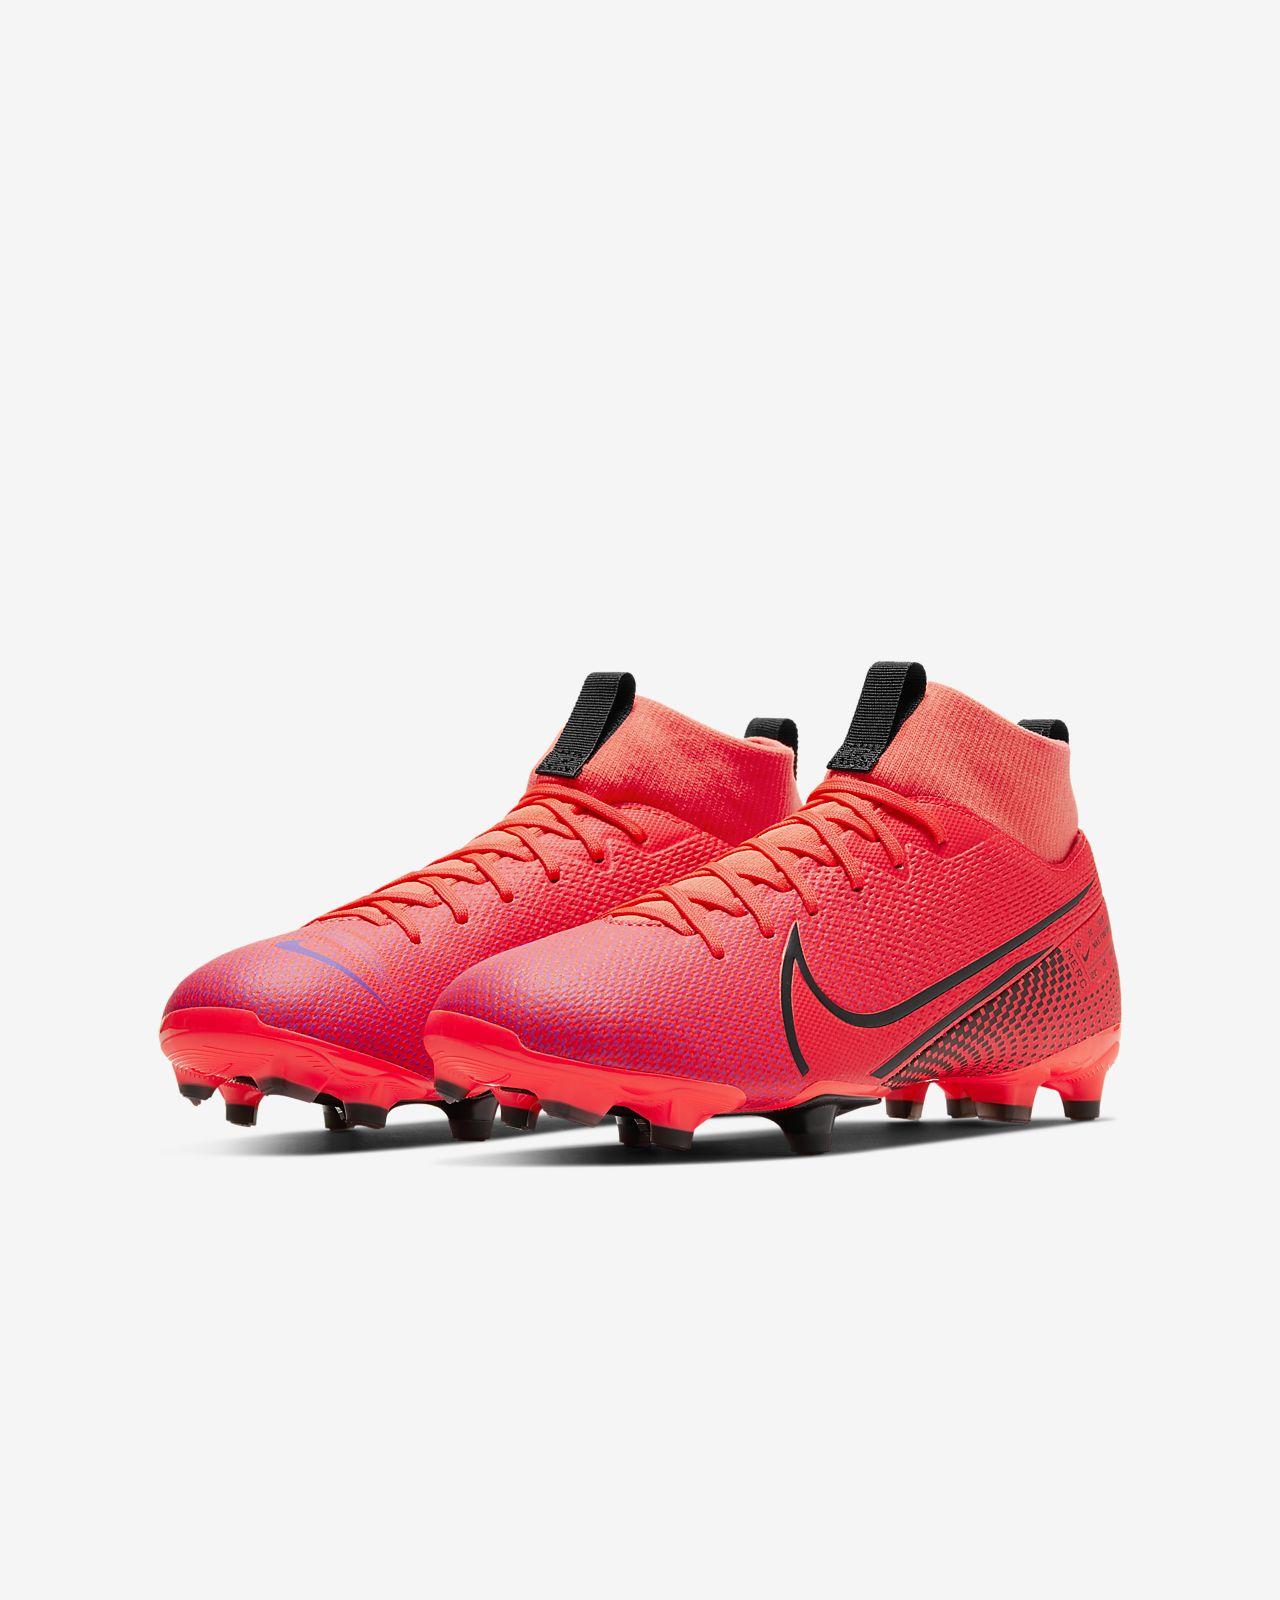 Scarpa da calcio multiterreno Nike Jr. Mercurial Superfly 7 Academy MG Bambini